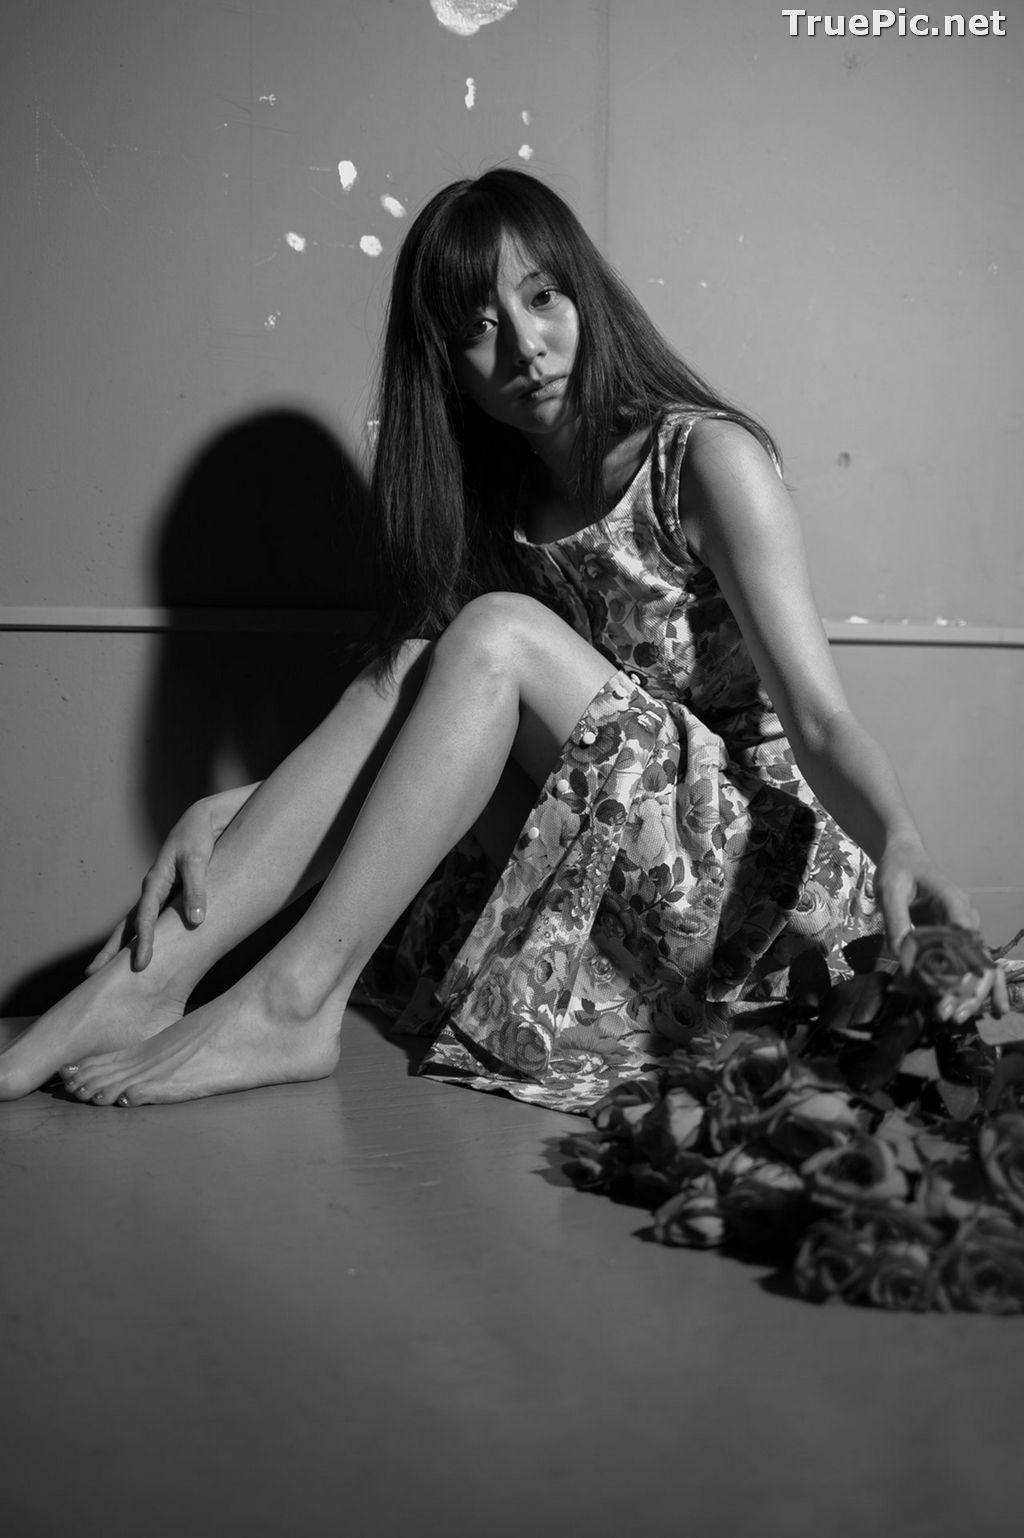 Image Japanese Model and Actress - Yumi Sugimoto - Yumi Mono Chrome - TruePic.net - Picture-4